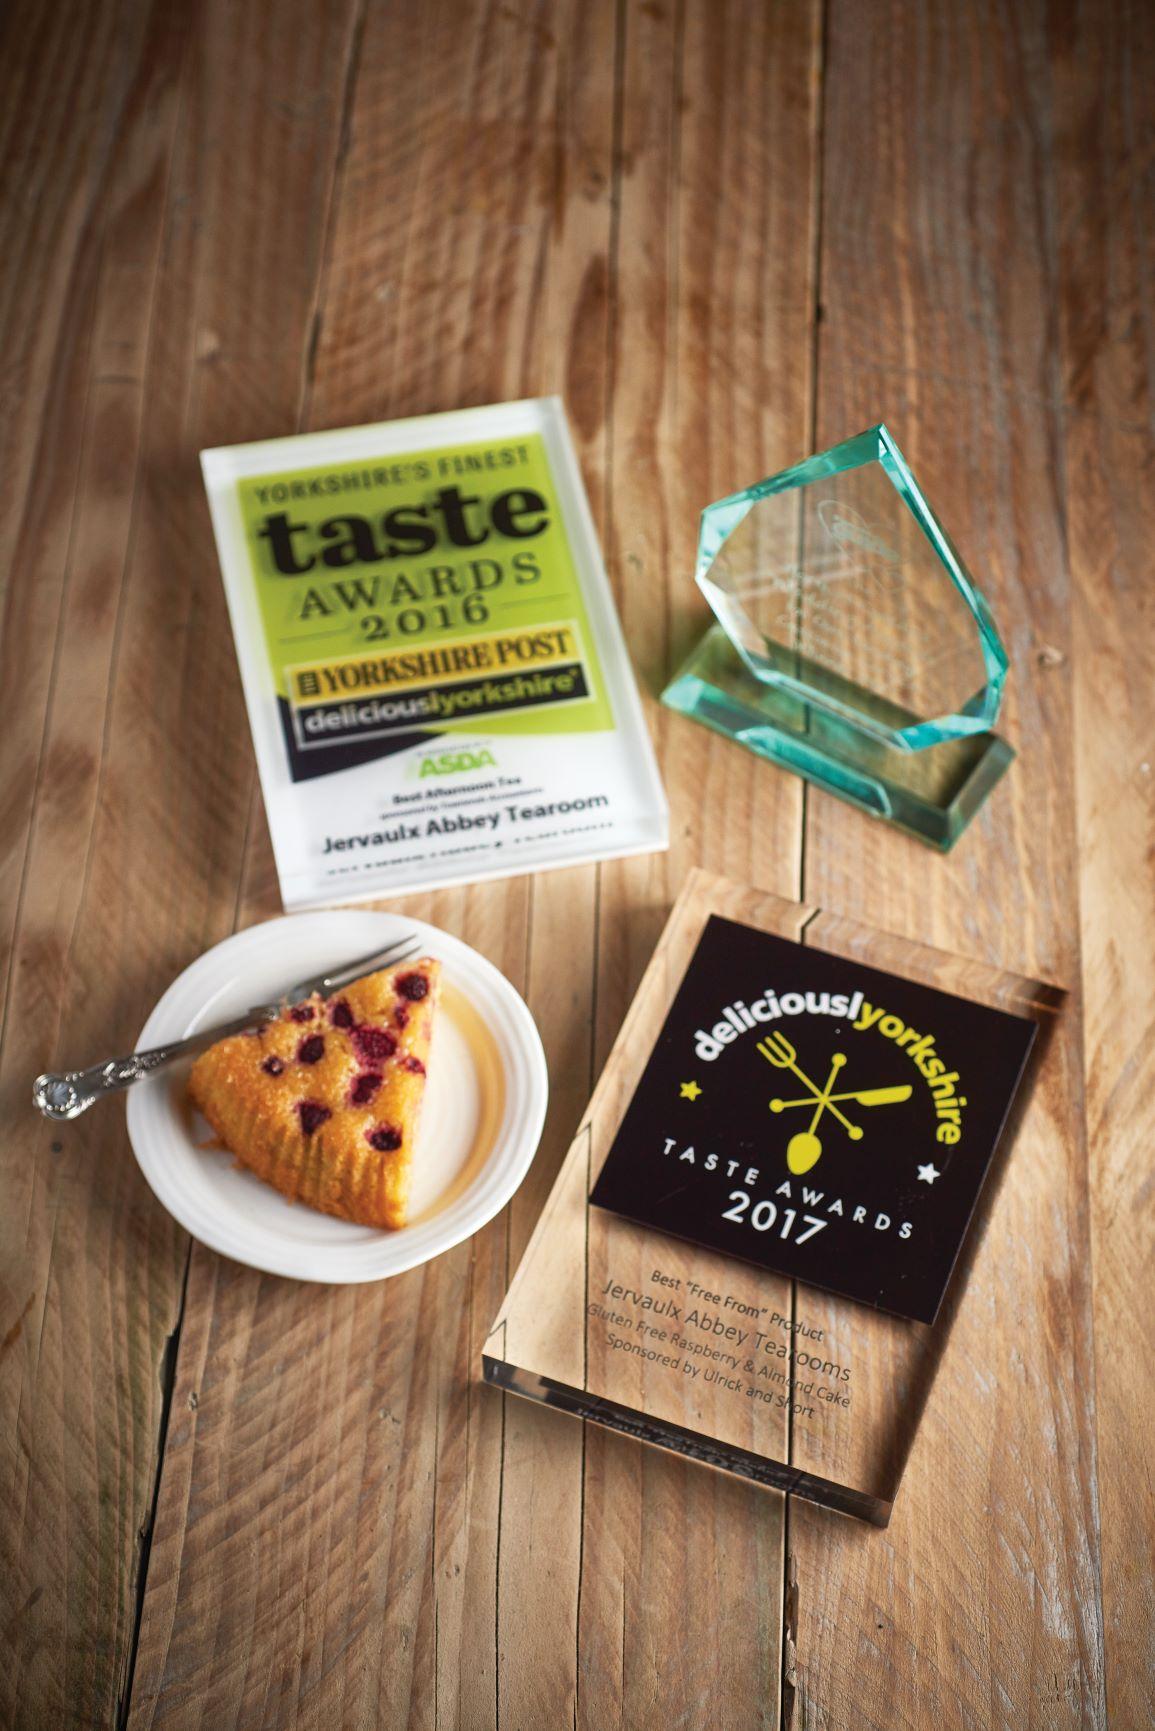 Award winning cake flavours